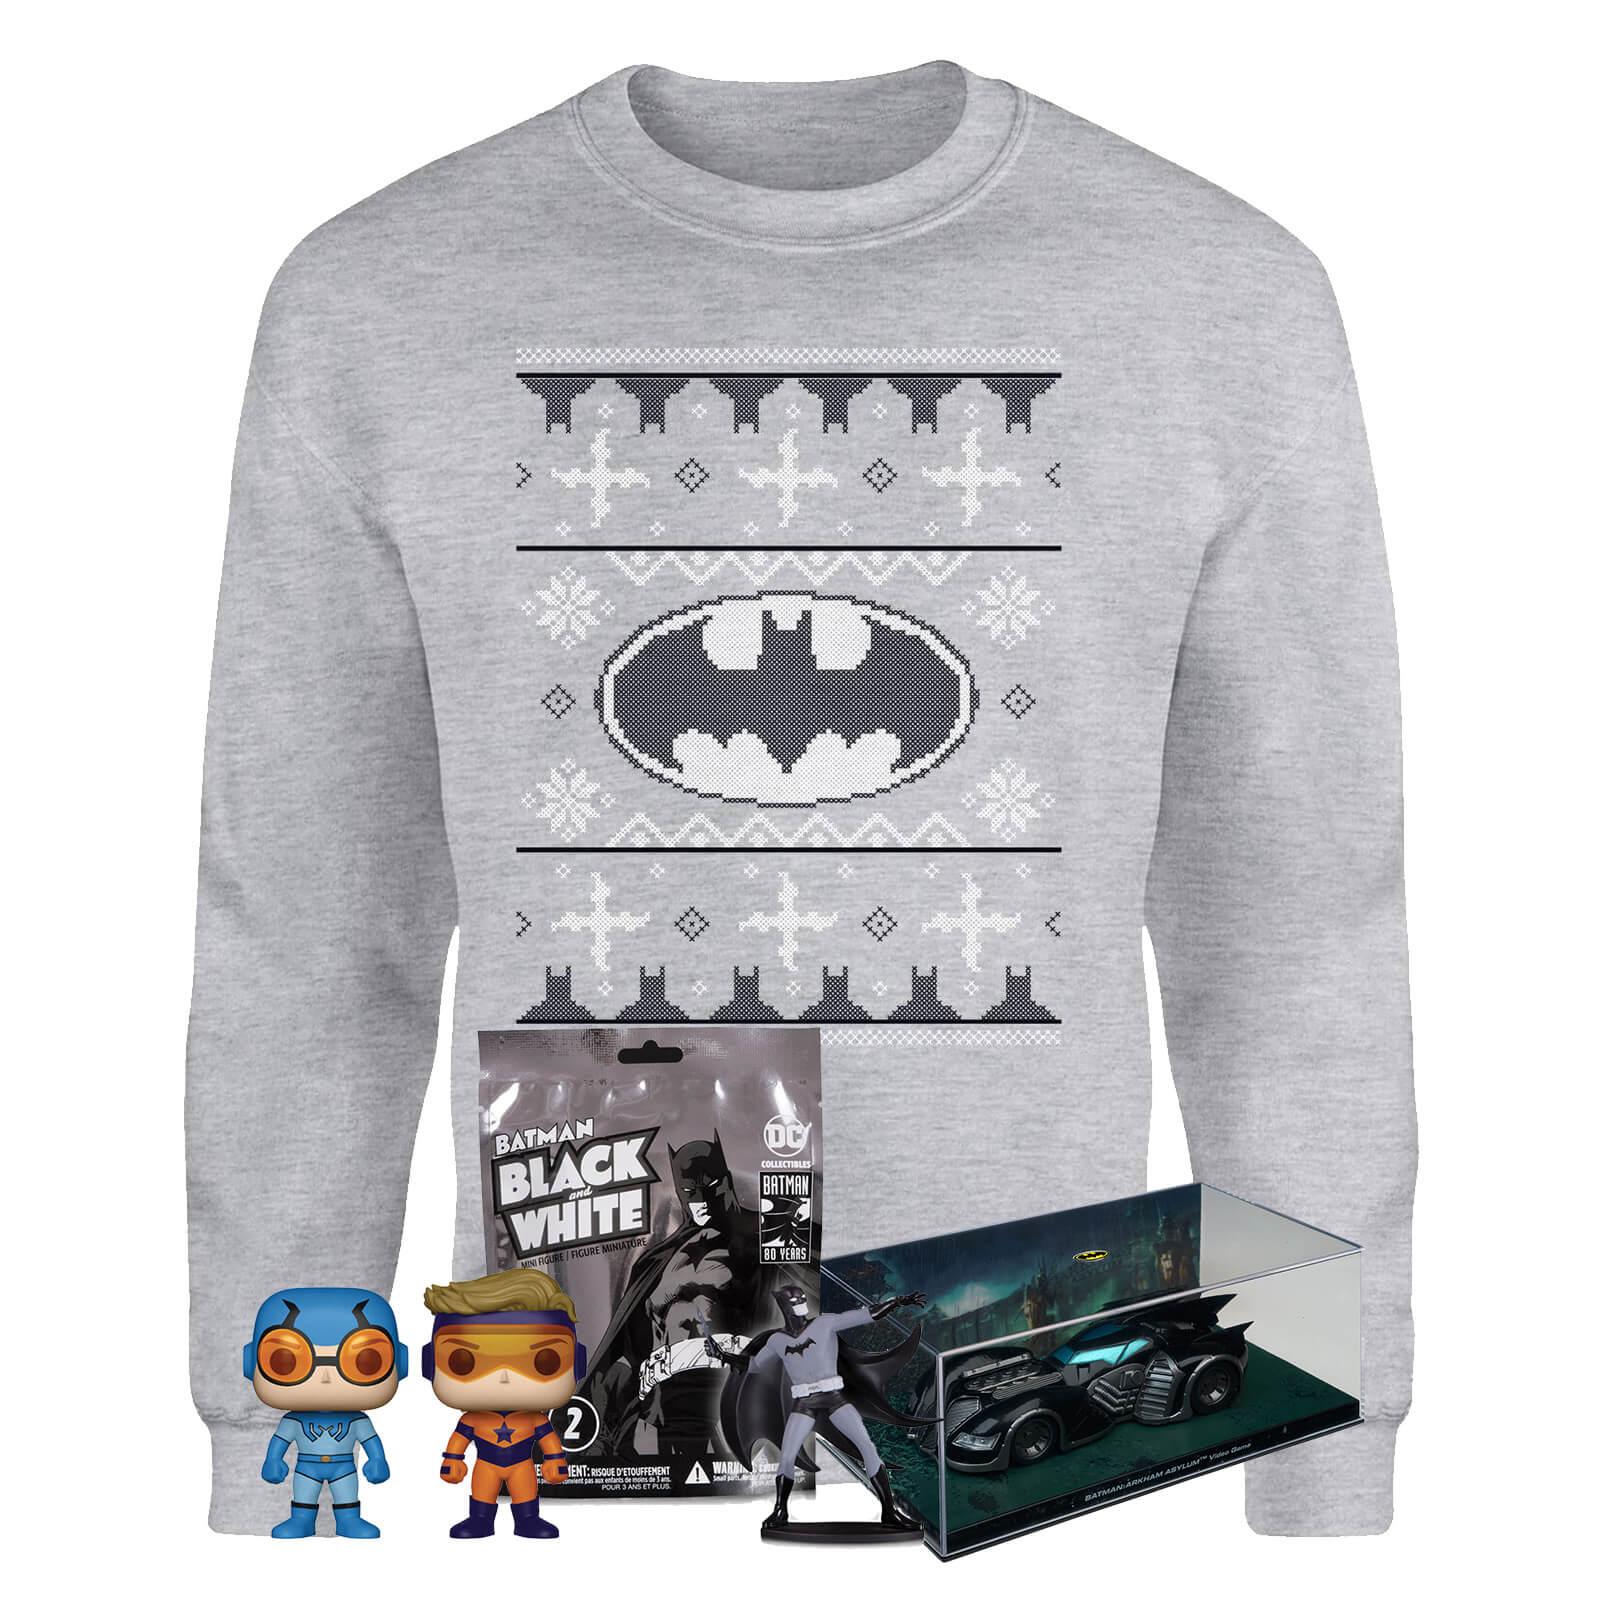 Lot de Noël DC Comics : 1 Pull de Noël Batman (S au XXL) + 1 réplique de la Batmobile + 1 Pop + 1 figurine Batman